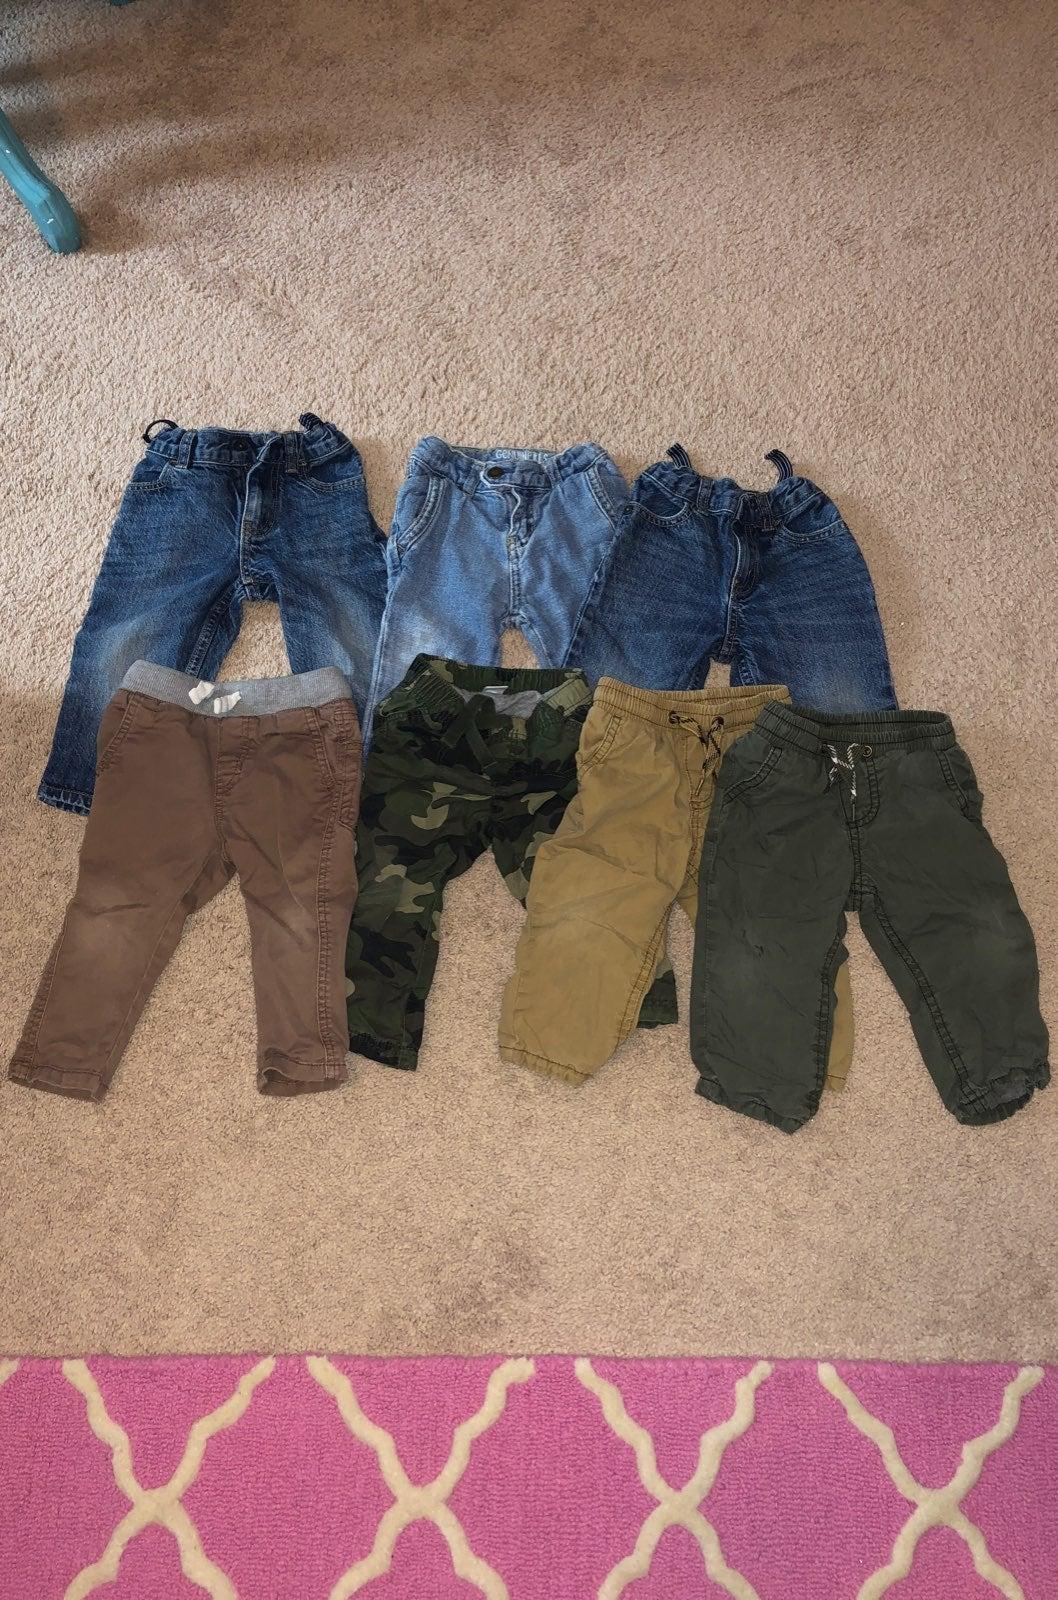 boys 12 month jeans pants lot of 7